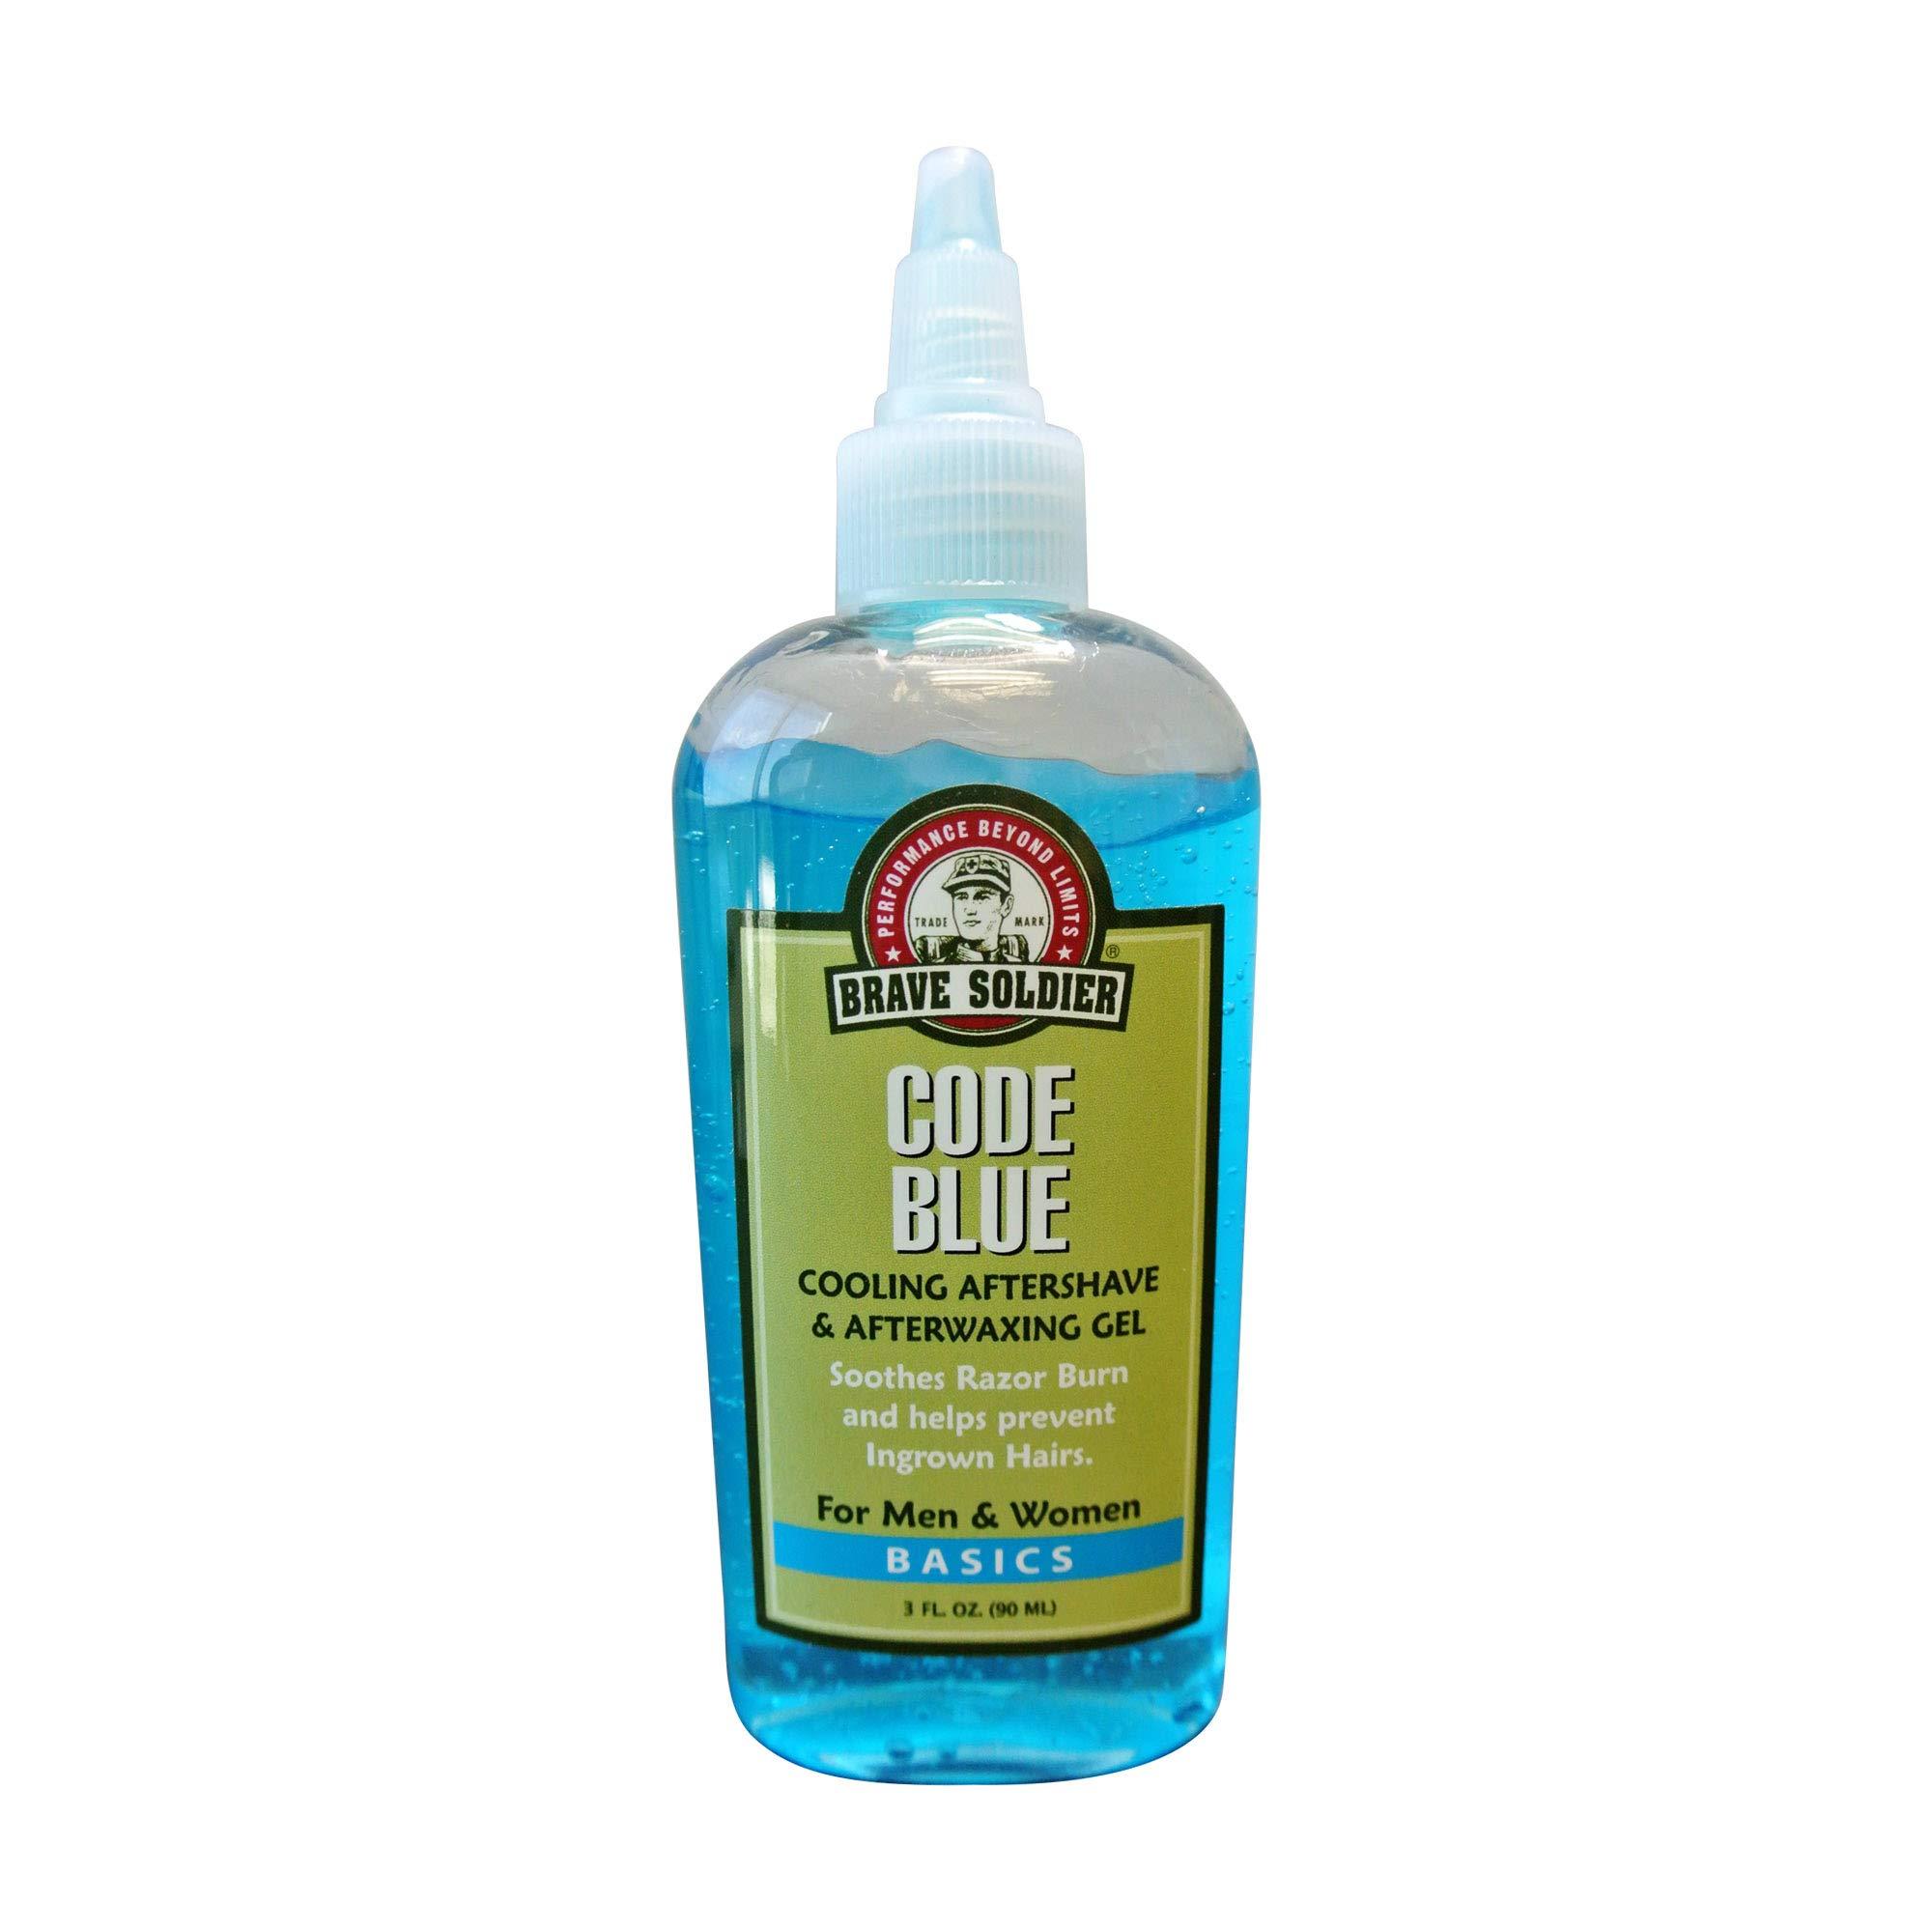 Brave Soldier Code Blue Aftershave for Men and Women - 3.4 fl. oz. - Cooling & Soothing Gel, Neck Burn Treatment, Sun Burn & Rash Relief